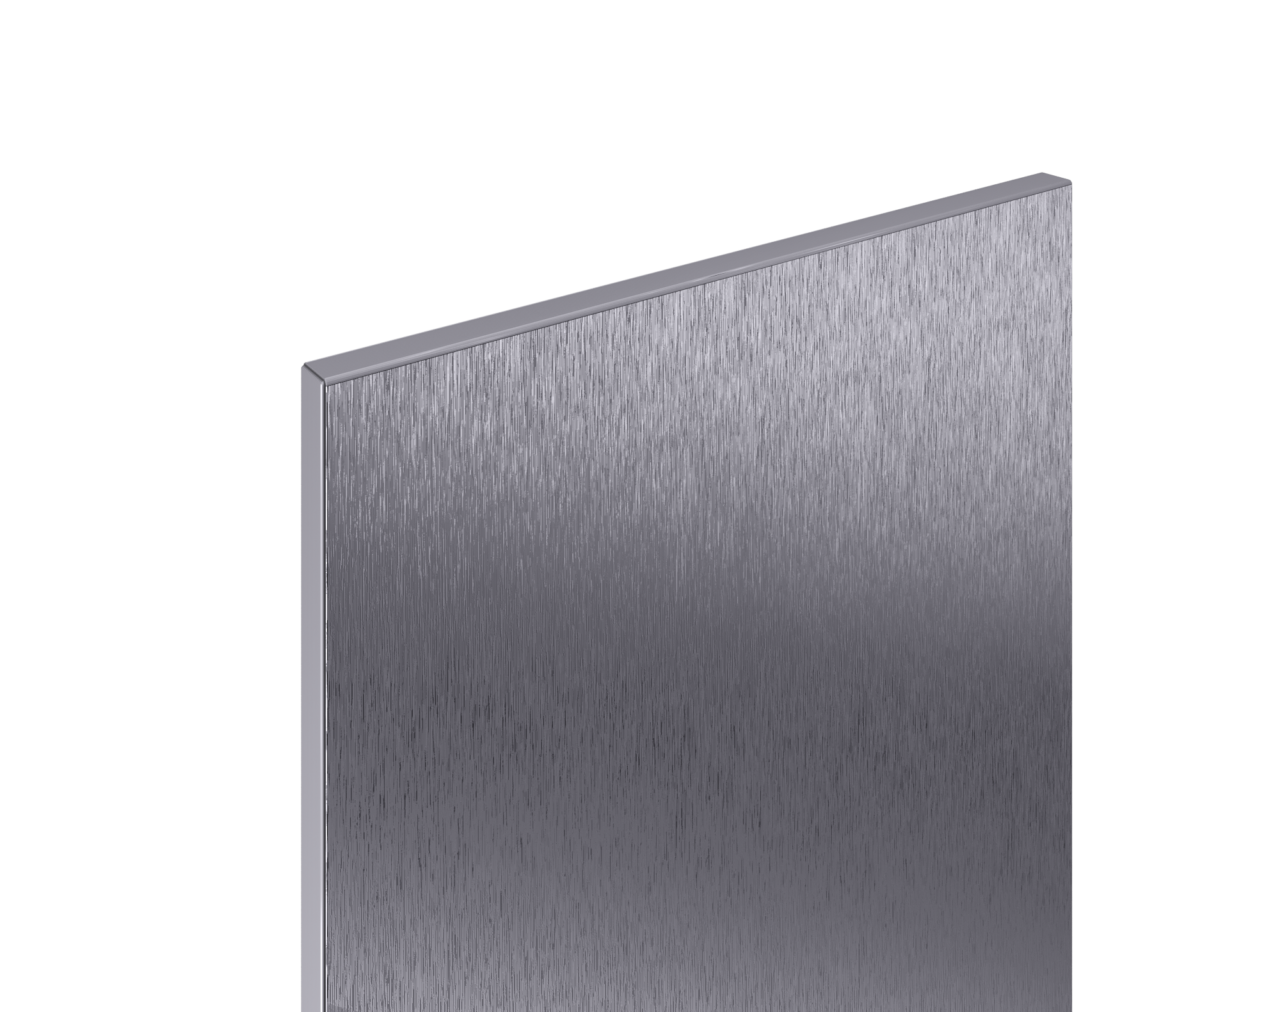 3 D Cabinet Reflections Brushed Metal LR